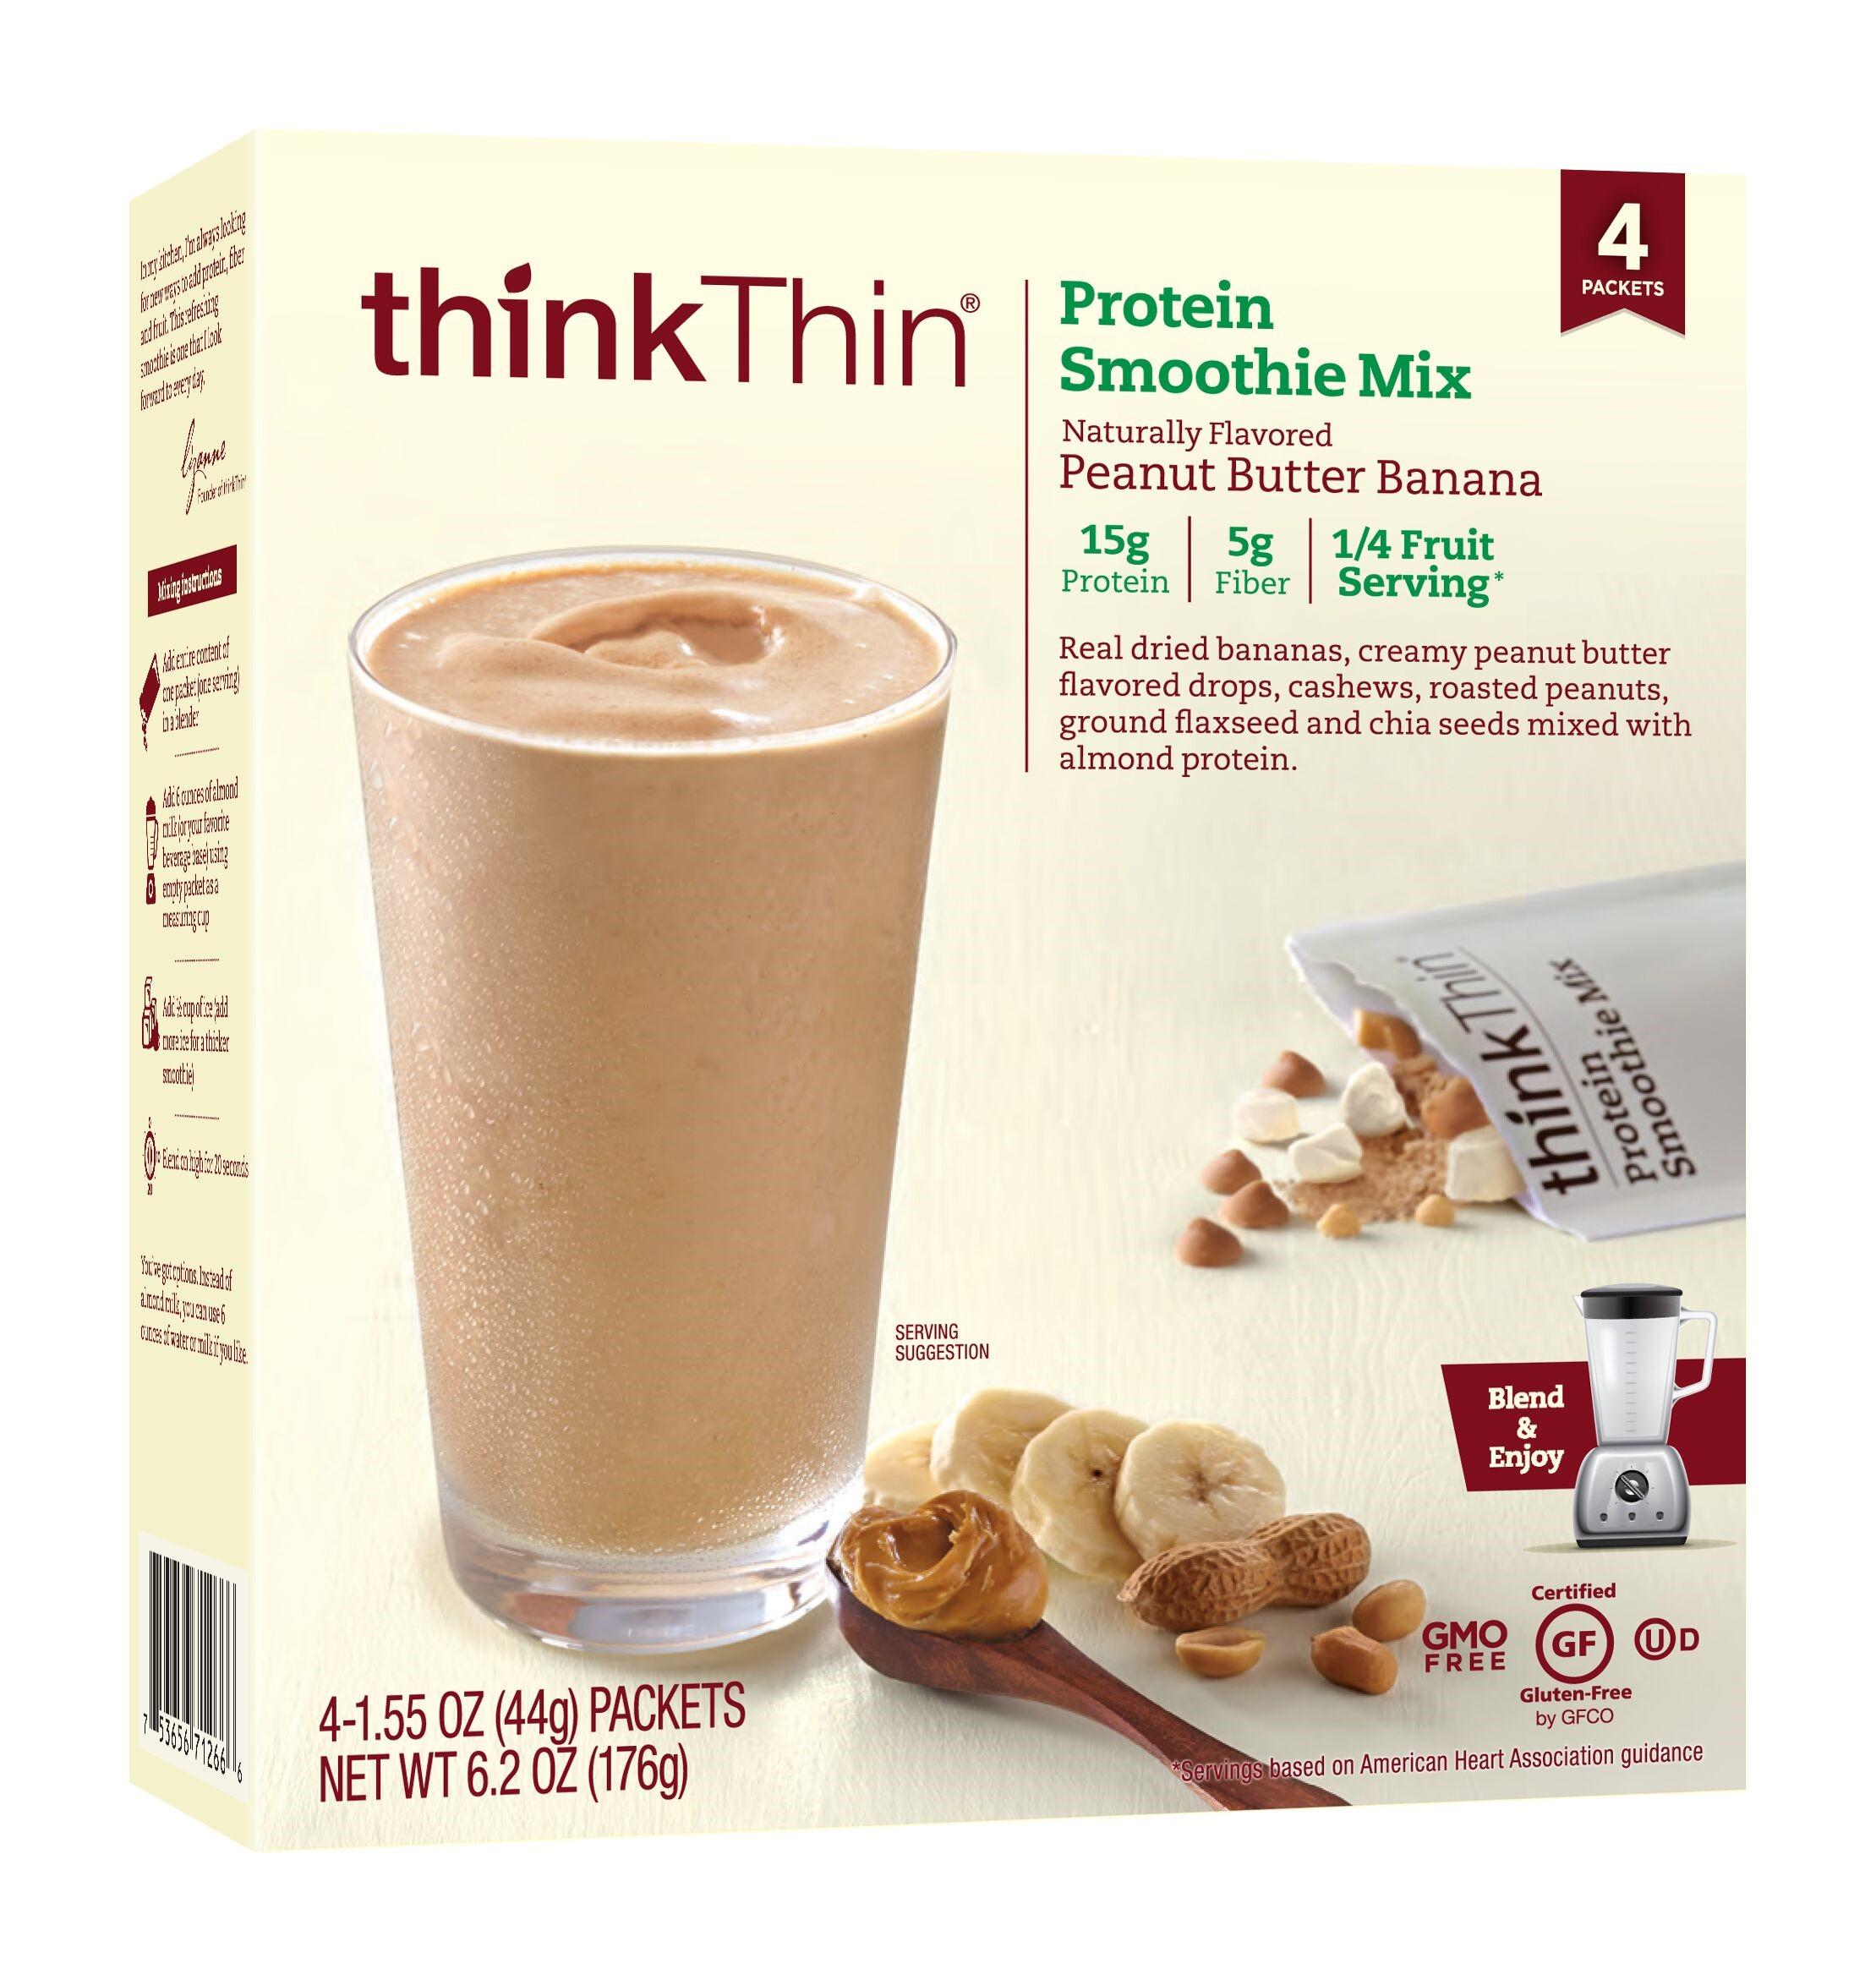 thinkThin Protein Smoothie Mix, Peanut Butter Banana, 1.55 Oz, 4 Ct